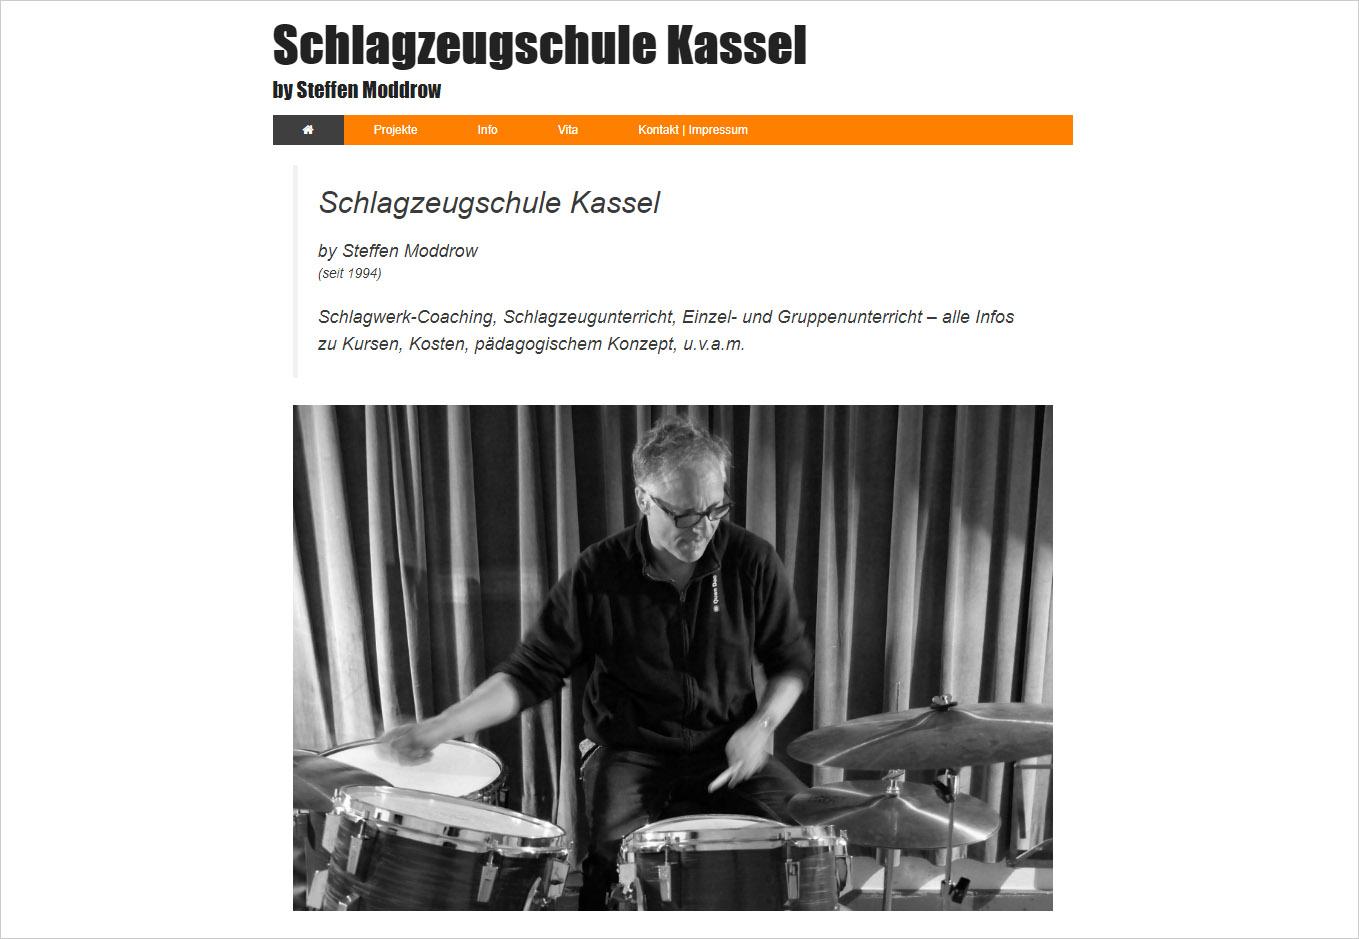 Schlagzeugschule Kassel